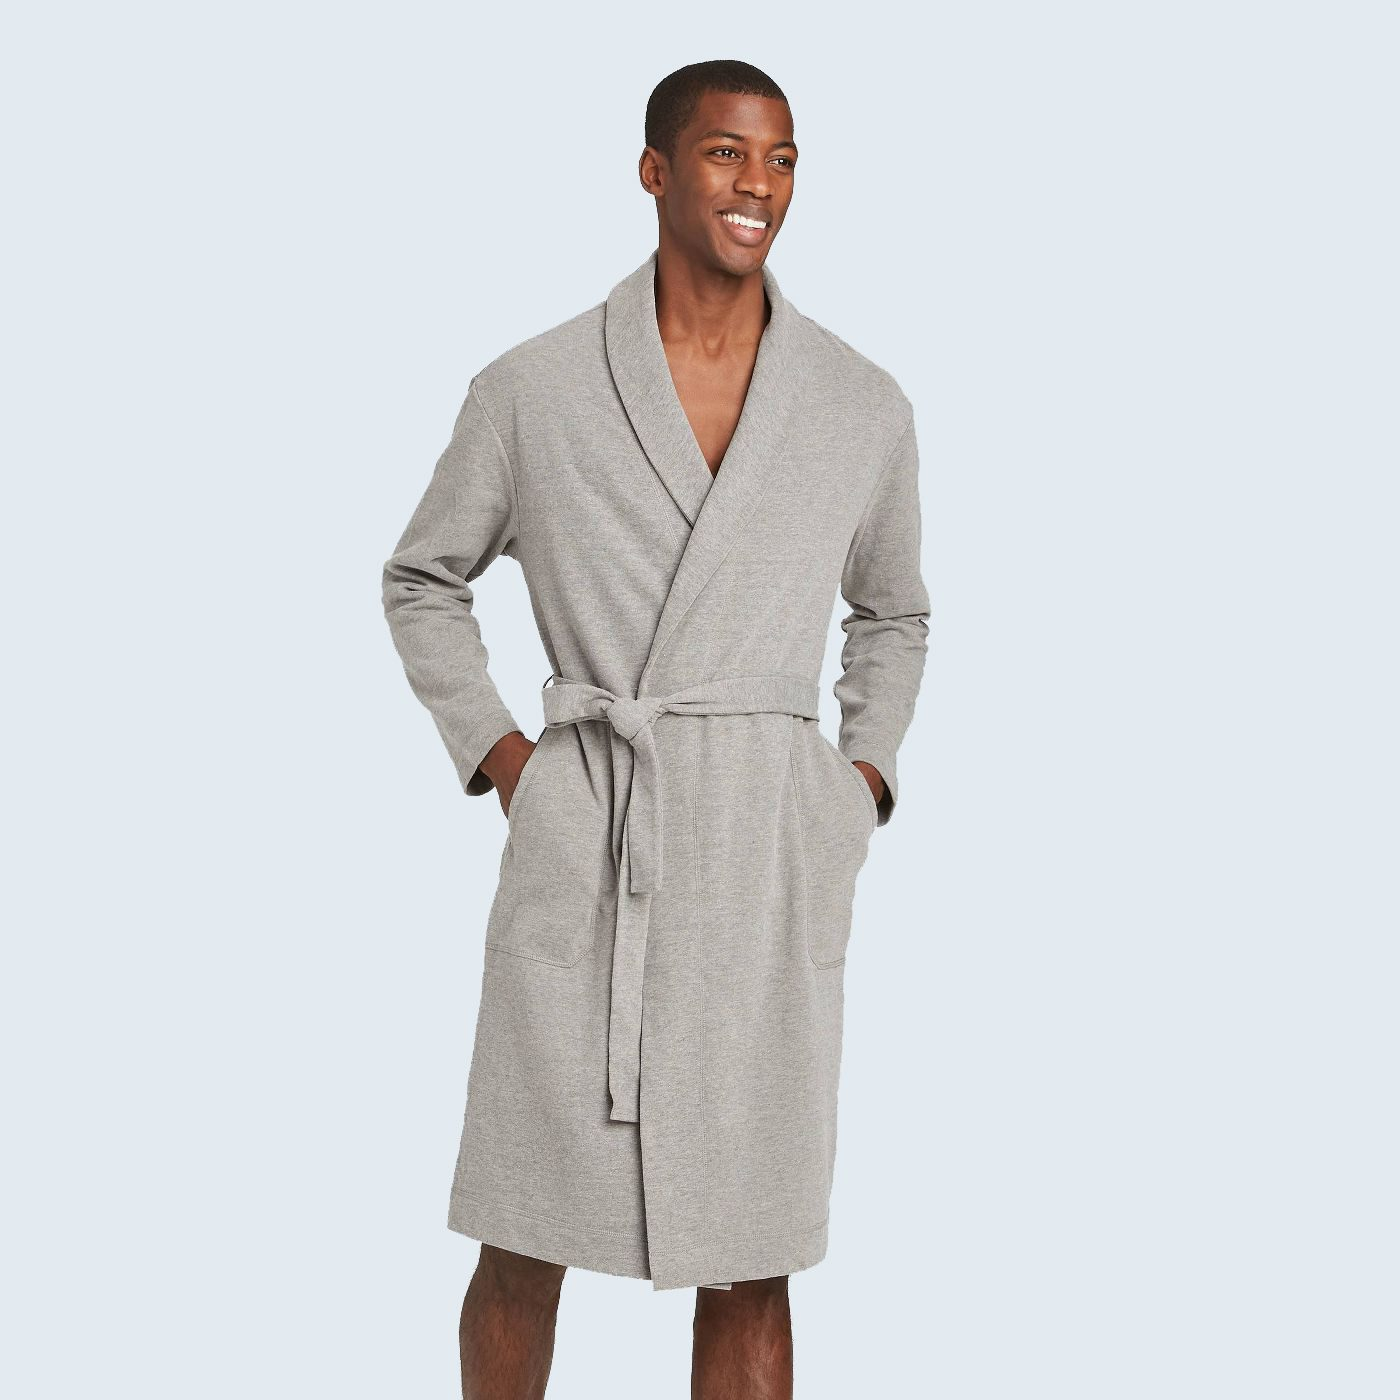 Goodfellow & Co. Robe